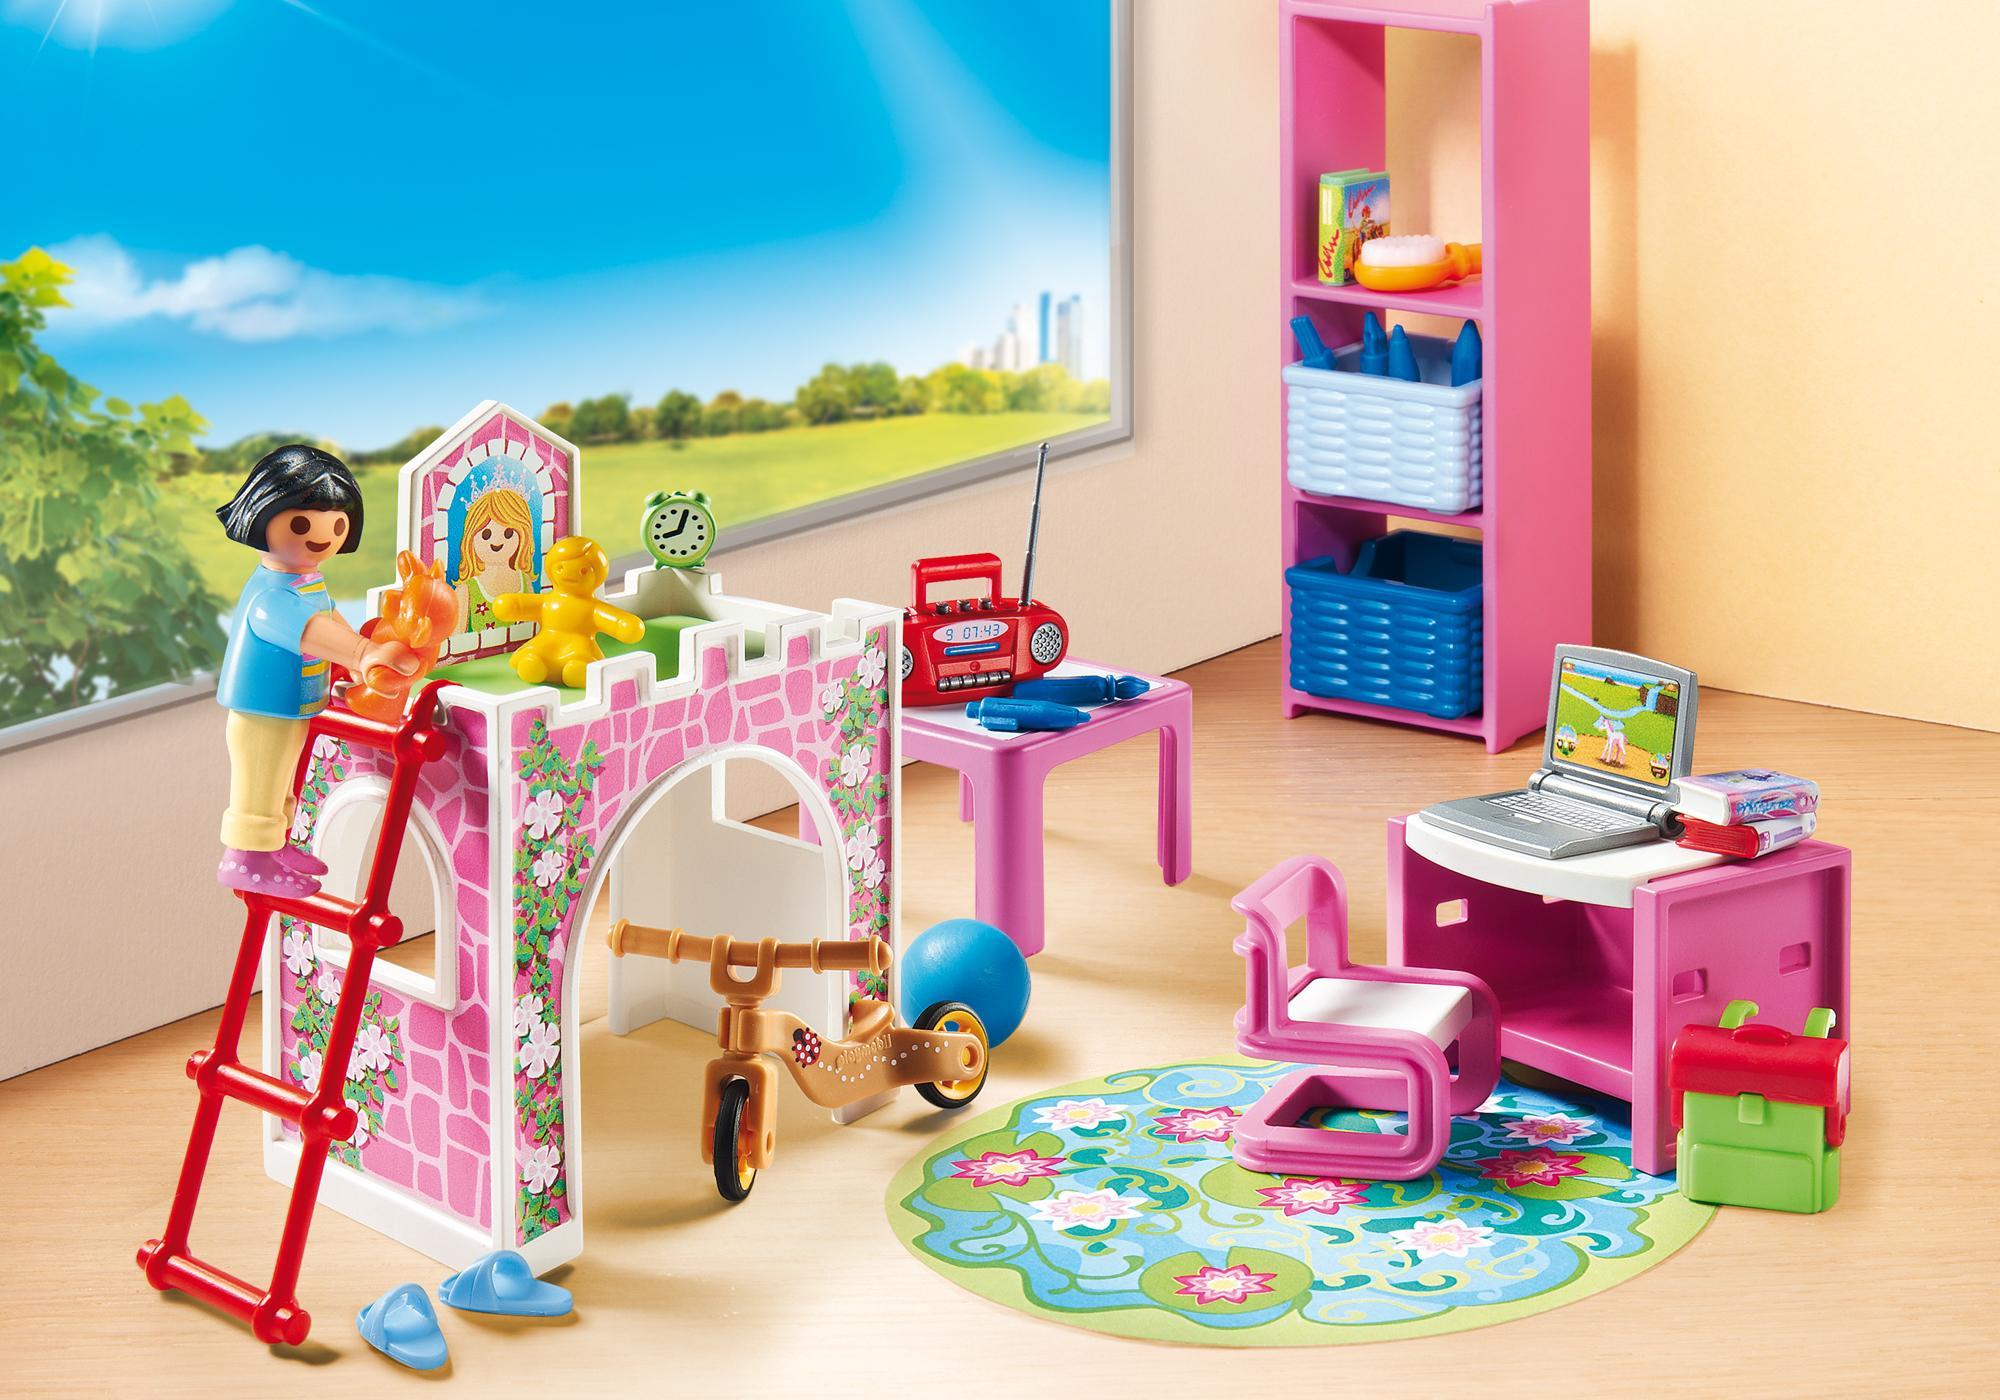 http://media.playmobil.com/i/playmobil/9270_product_detail/Habitación Infantil